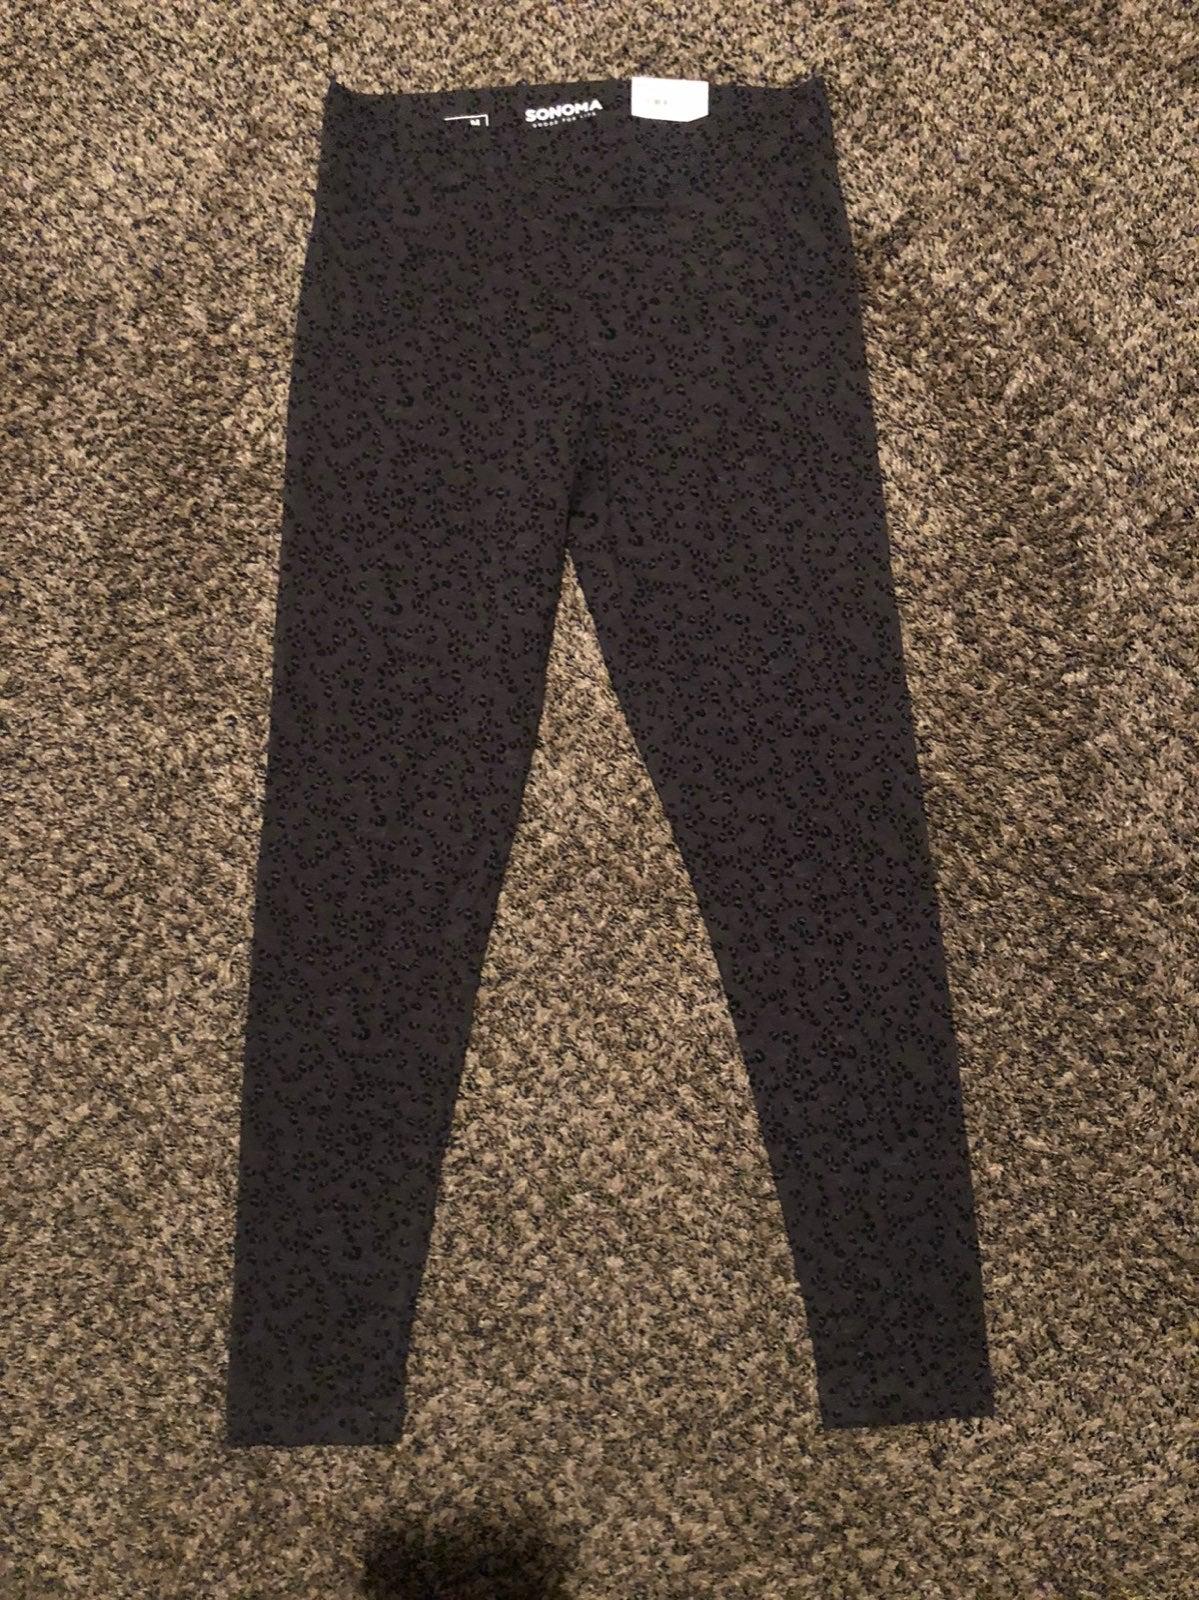 New! Sonoma leggings.